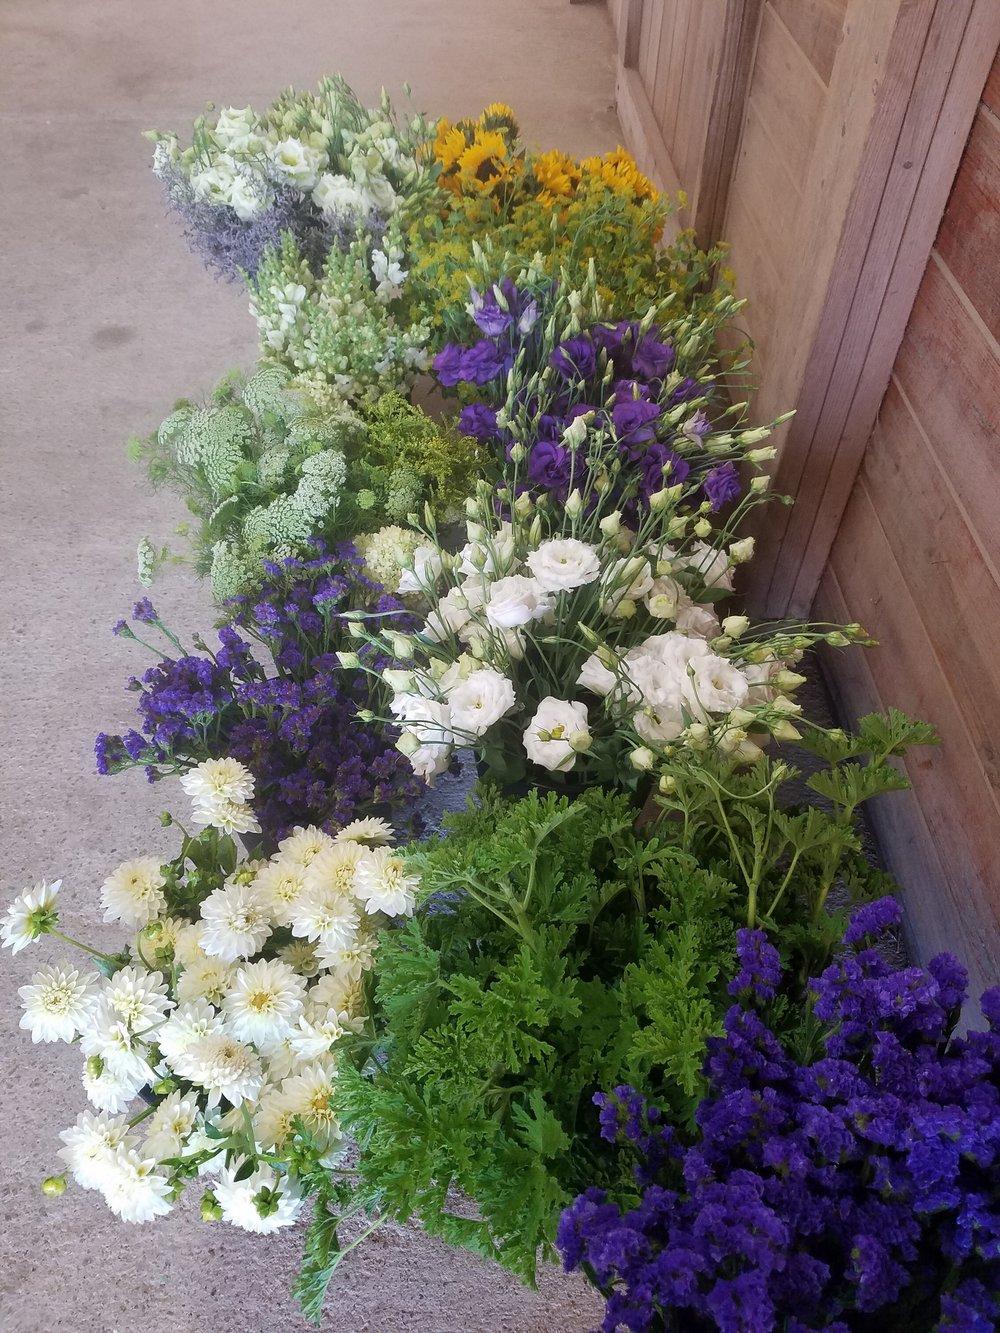 flower-buckets-local-farm.jpg